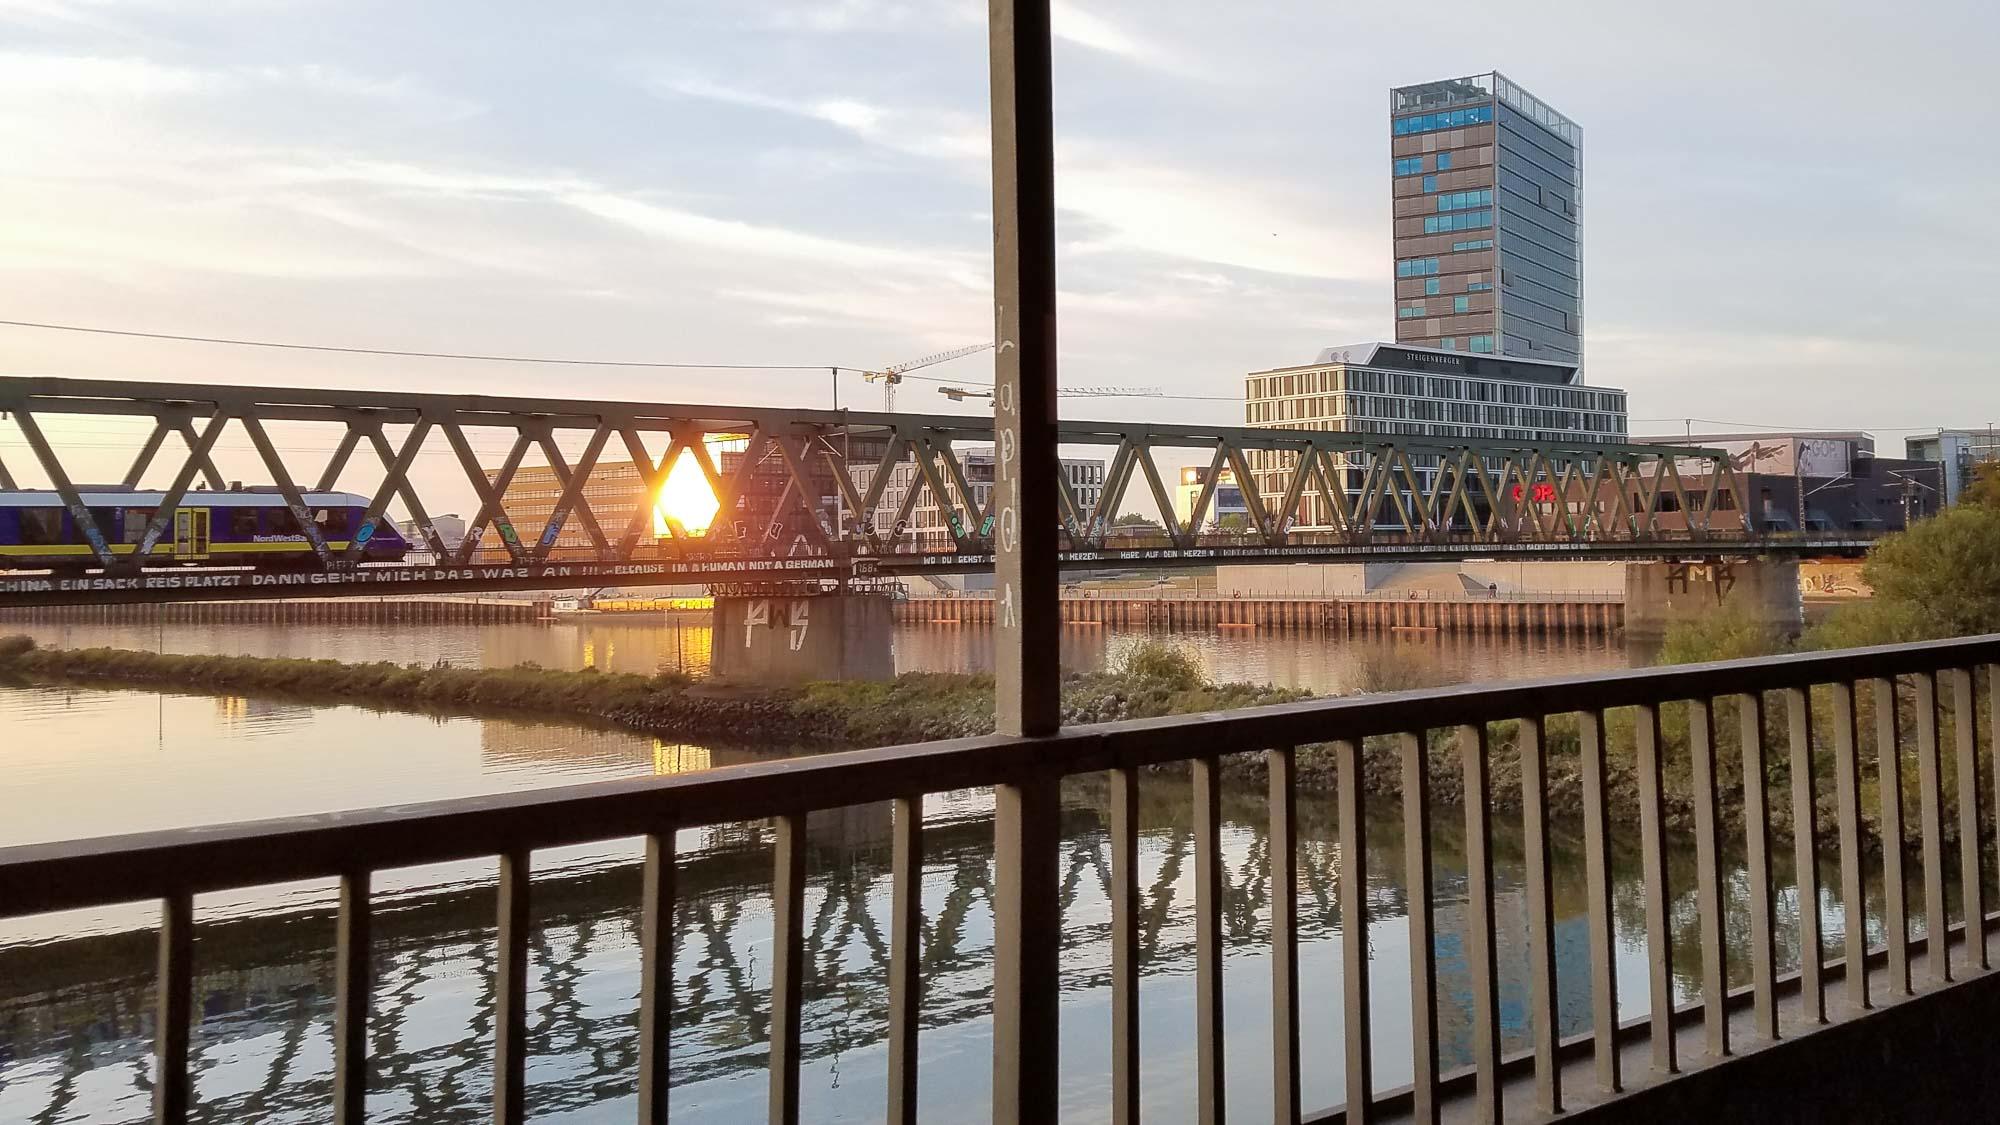 Pedestrian bridge across the Weser River in Bremen, Germany.